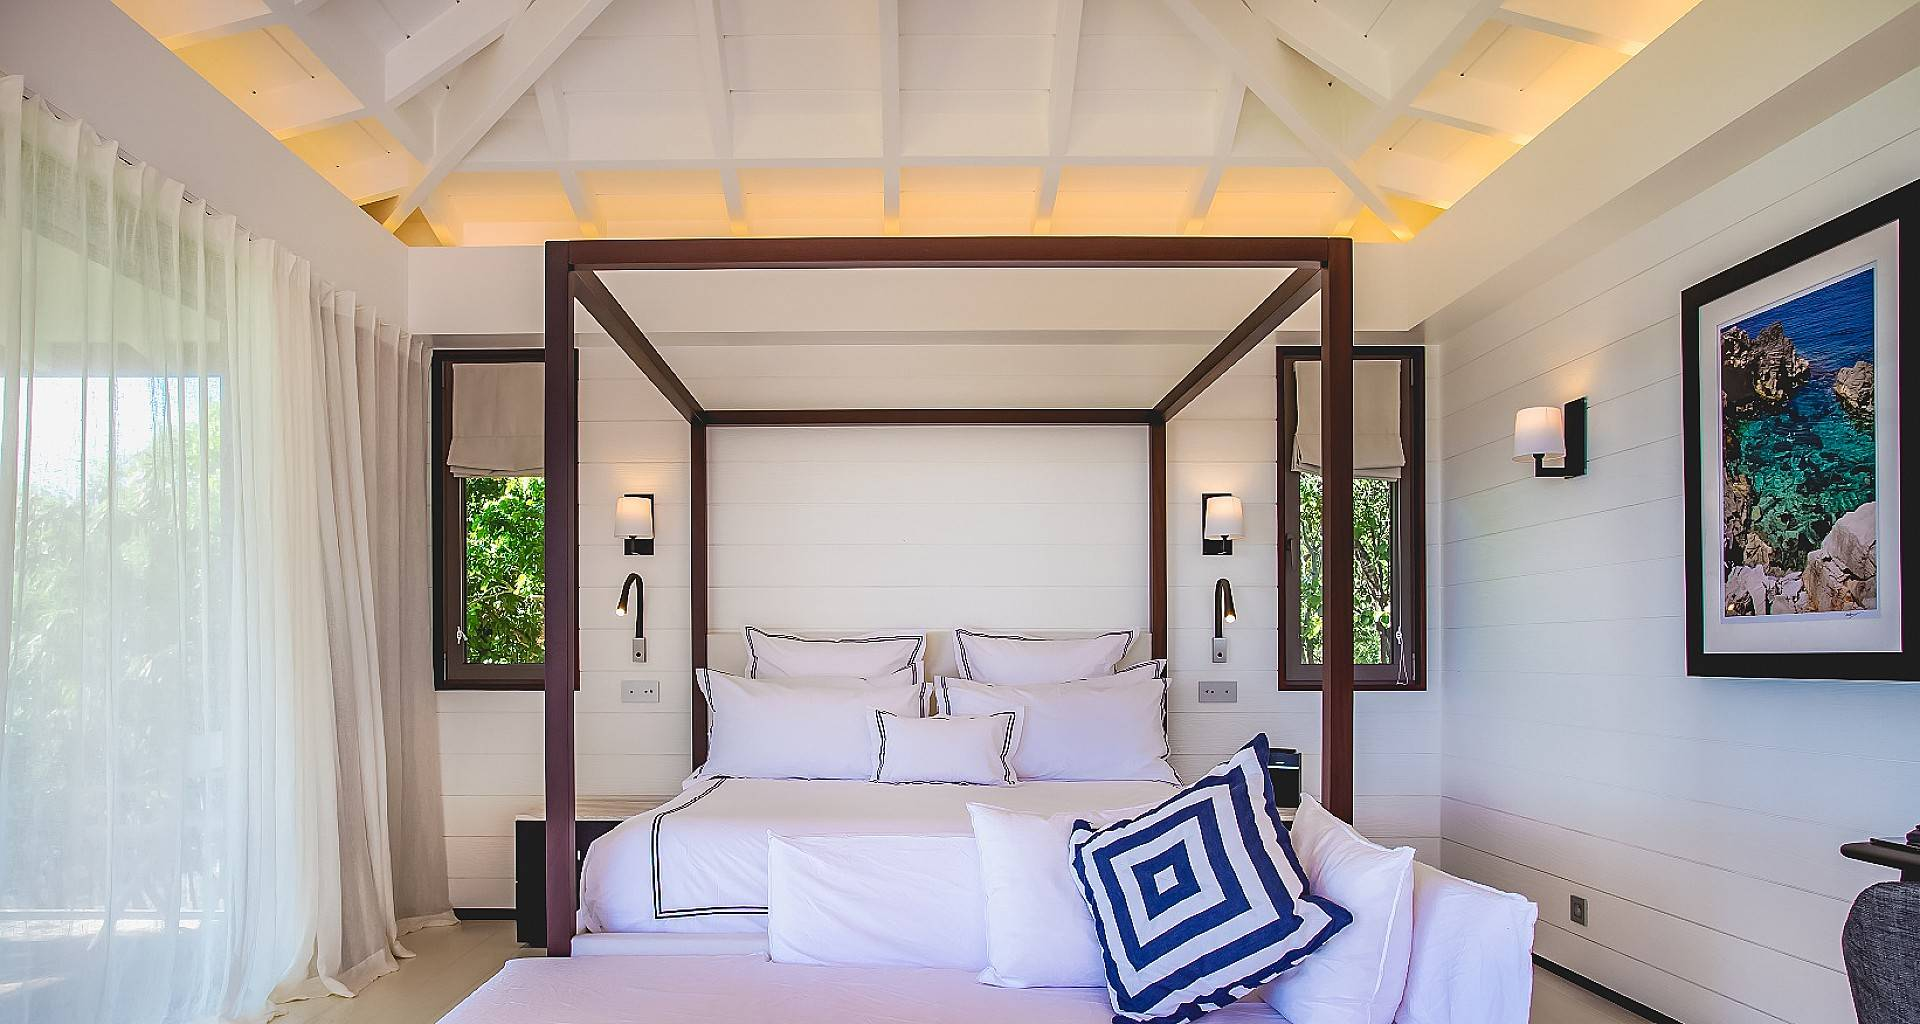 Villa Maison Blanc Bleu Bedroom 2